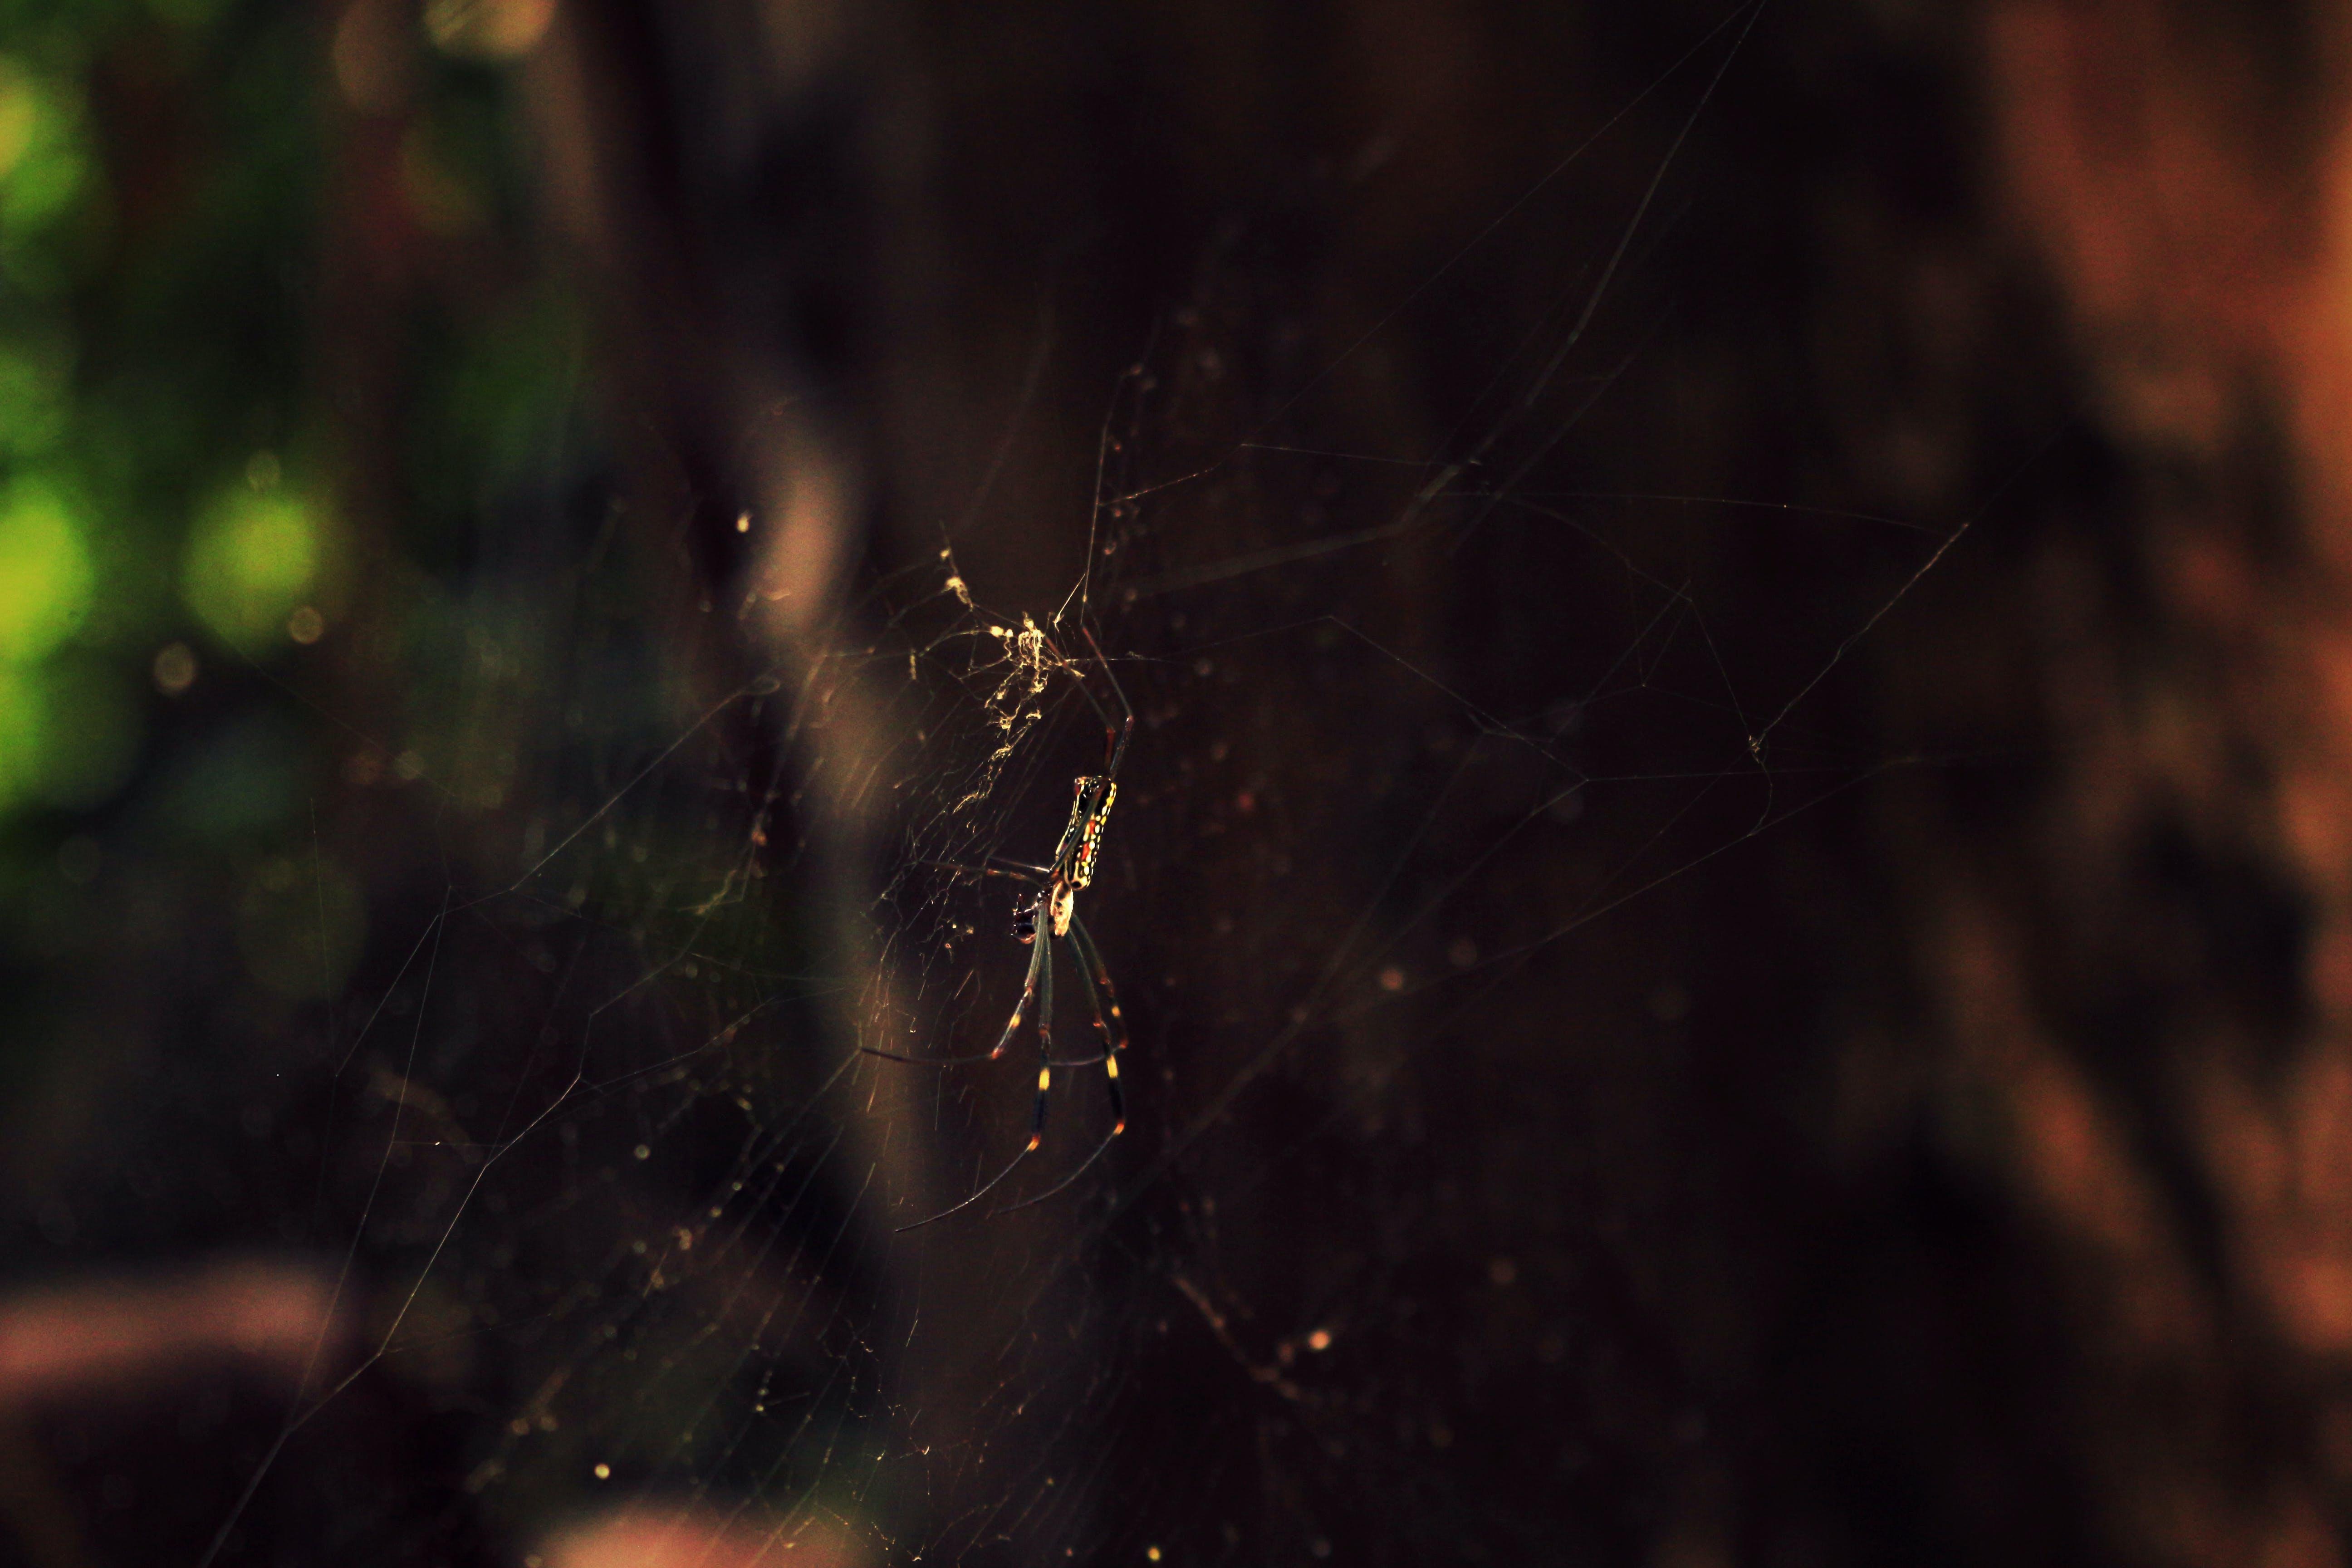 insekt, natur, netz